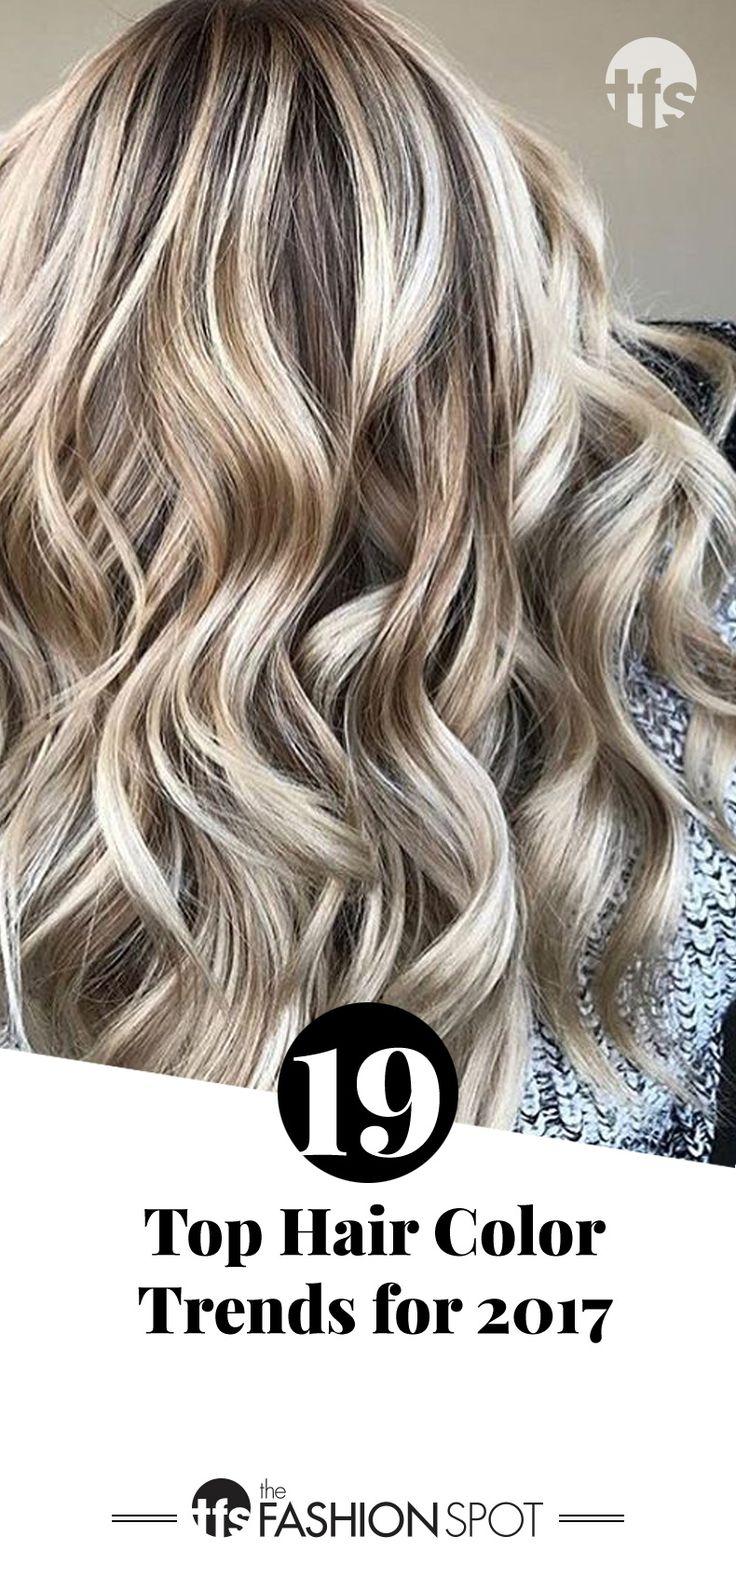 Best 25+ Popular hair colors ideas on Pinterest   Hair ...